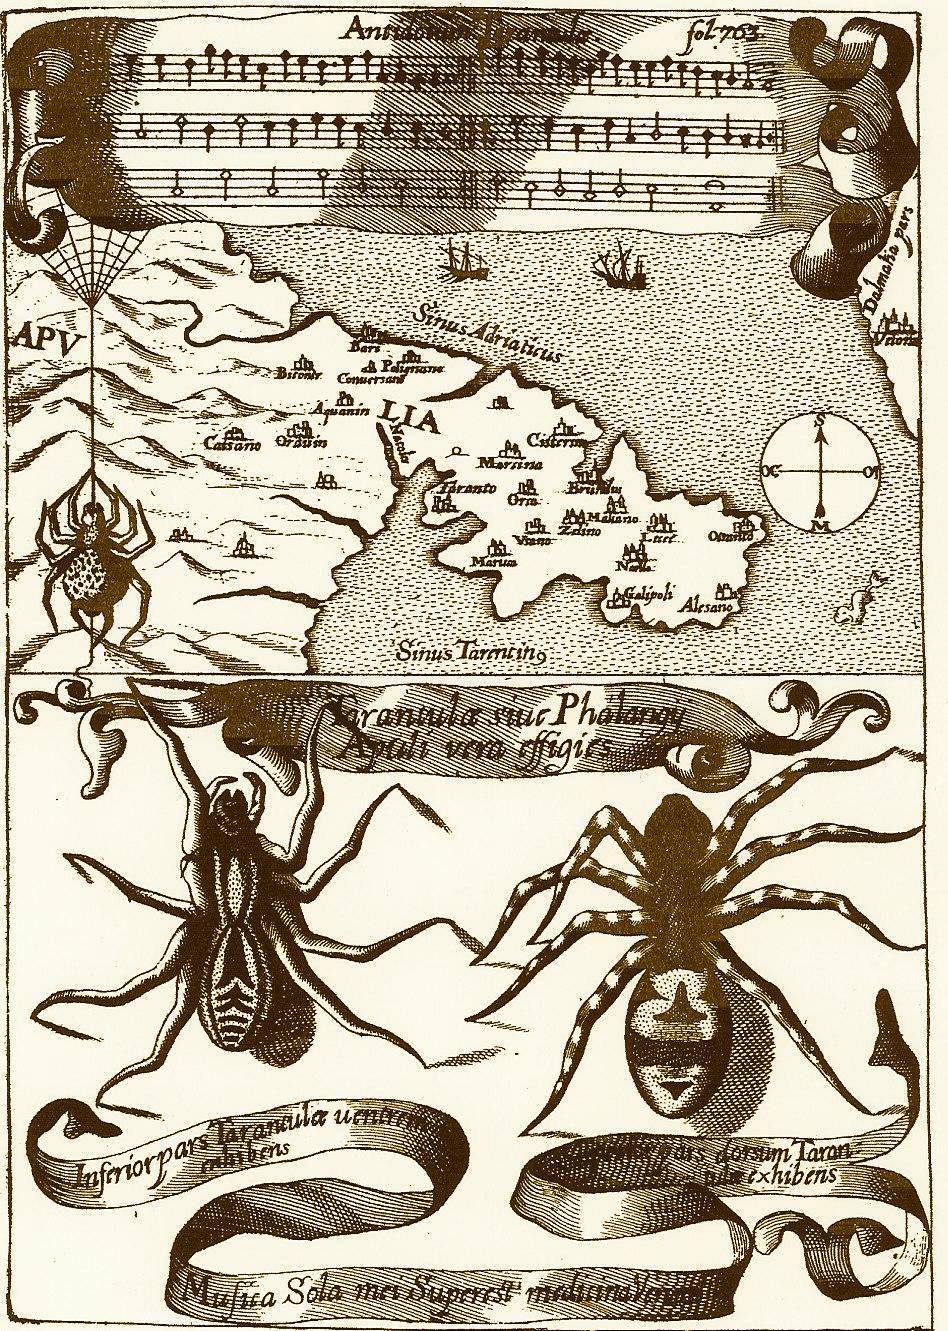 Antidotum-Tarantulae.-Dal-Magnes-sive-de-magnetica-arte-1644-del-P.-Atanasio-Kircher